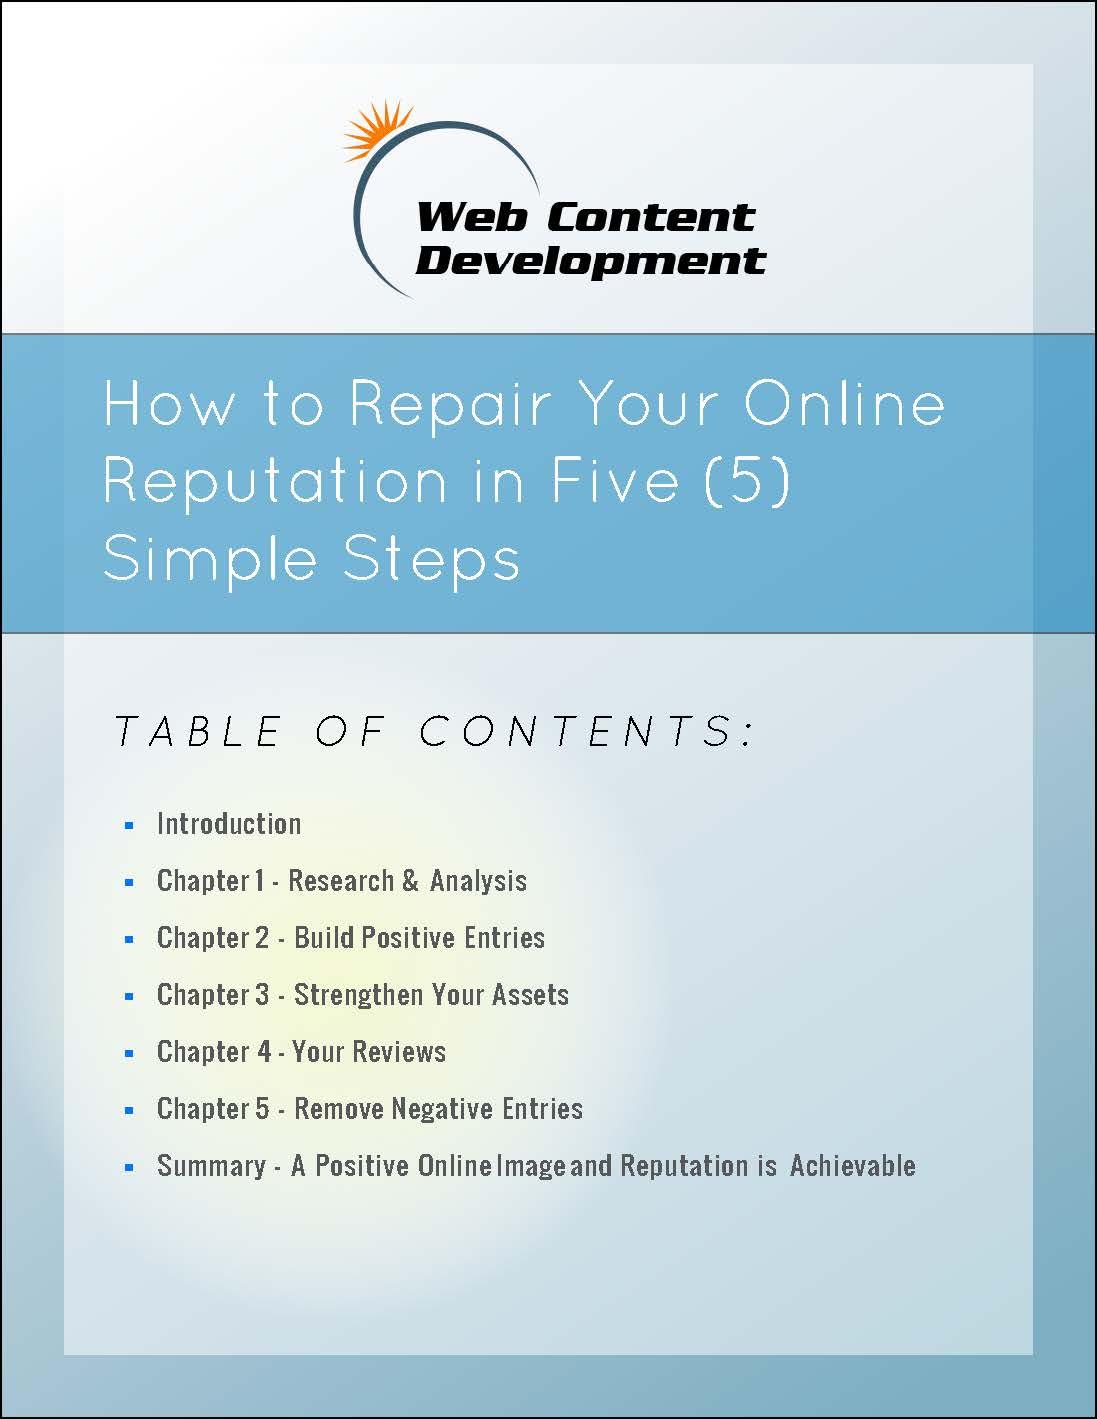 Repairing your Online Reputation